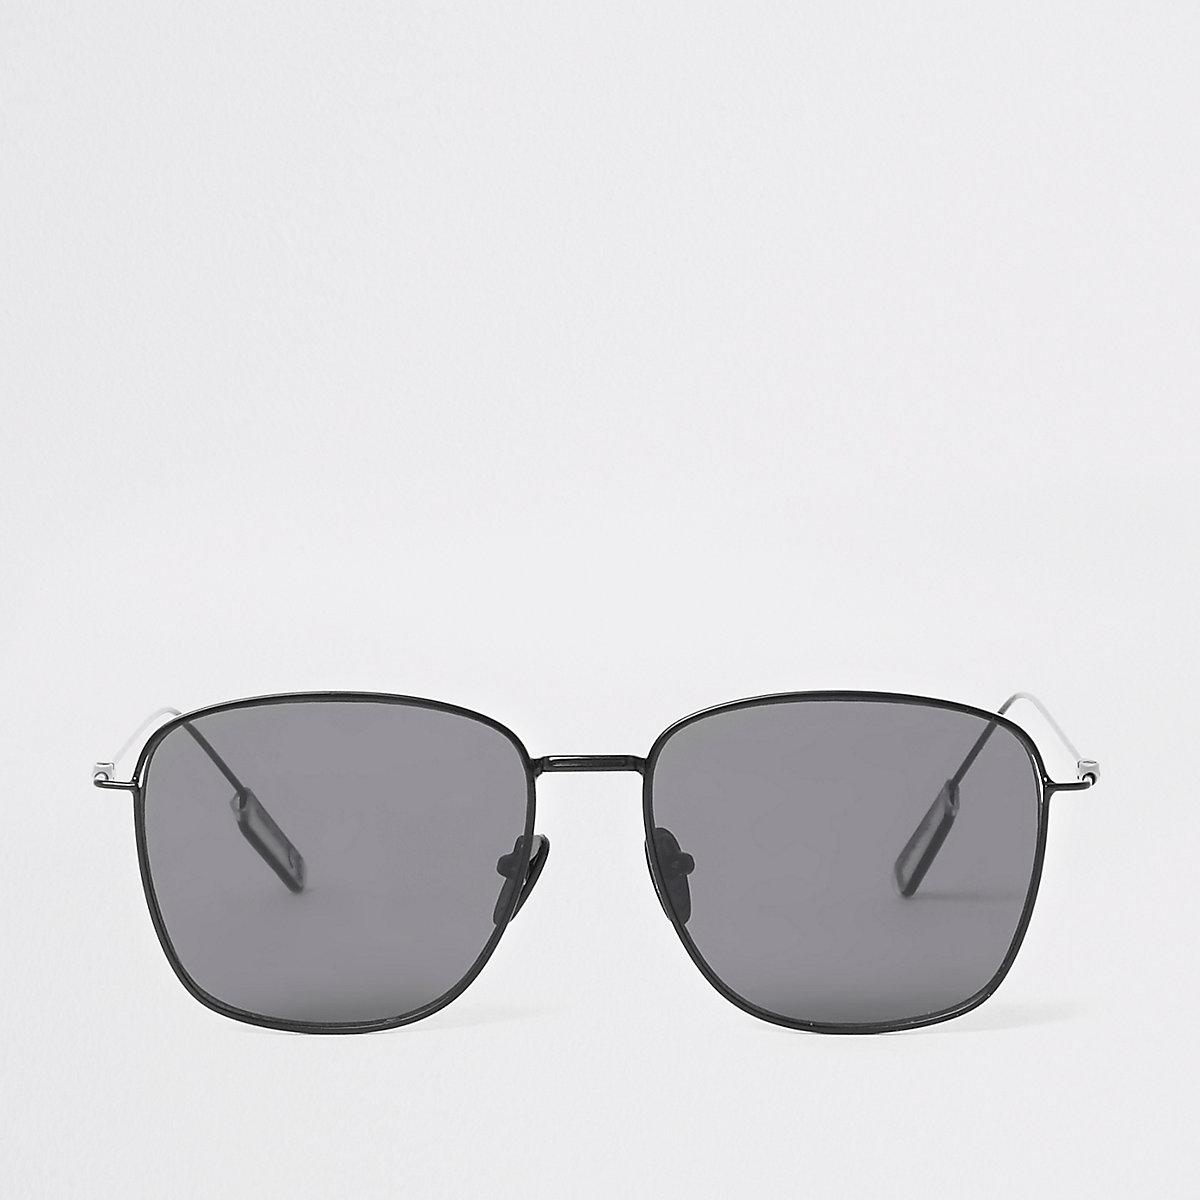 Black hexagon sunglasses